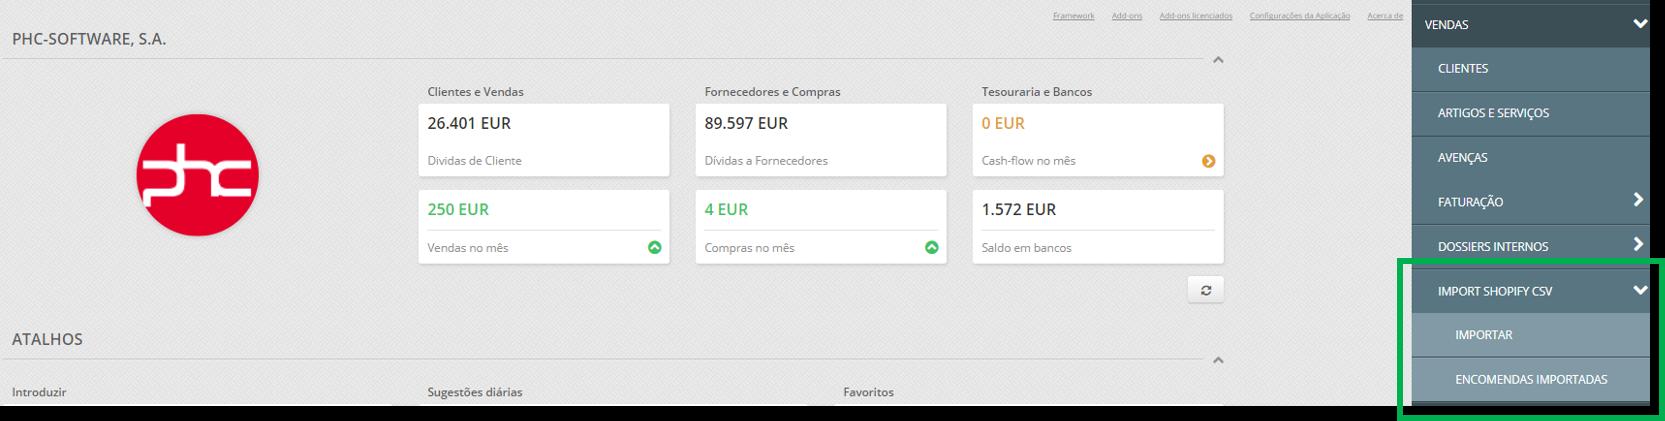 importar+encomed«ndas